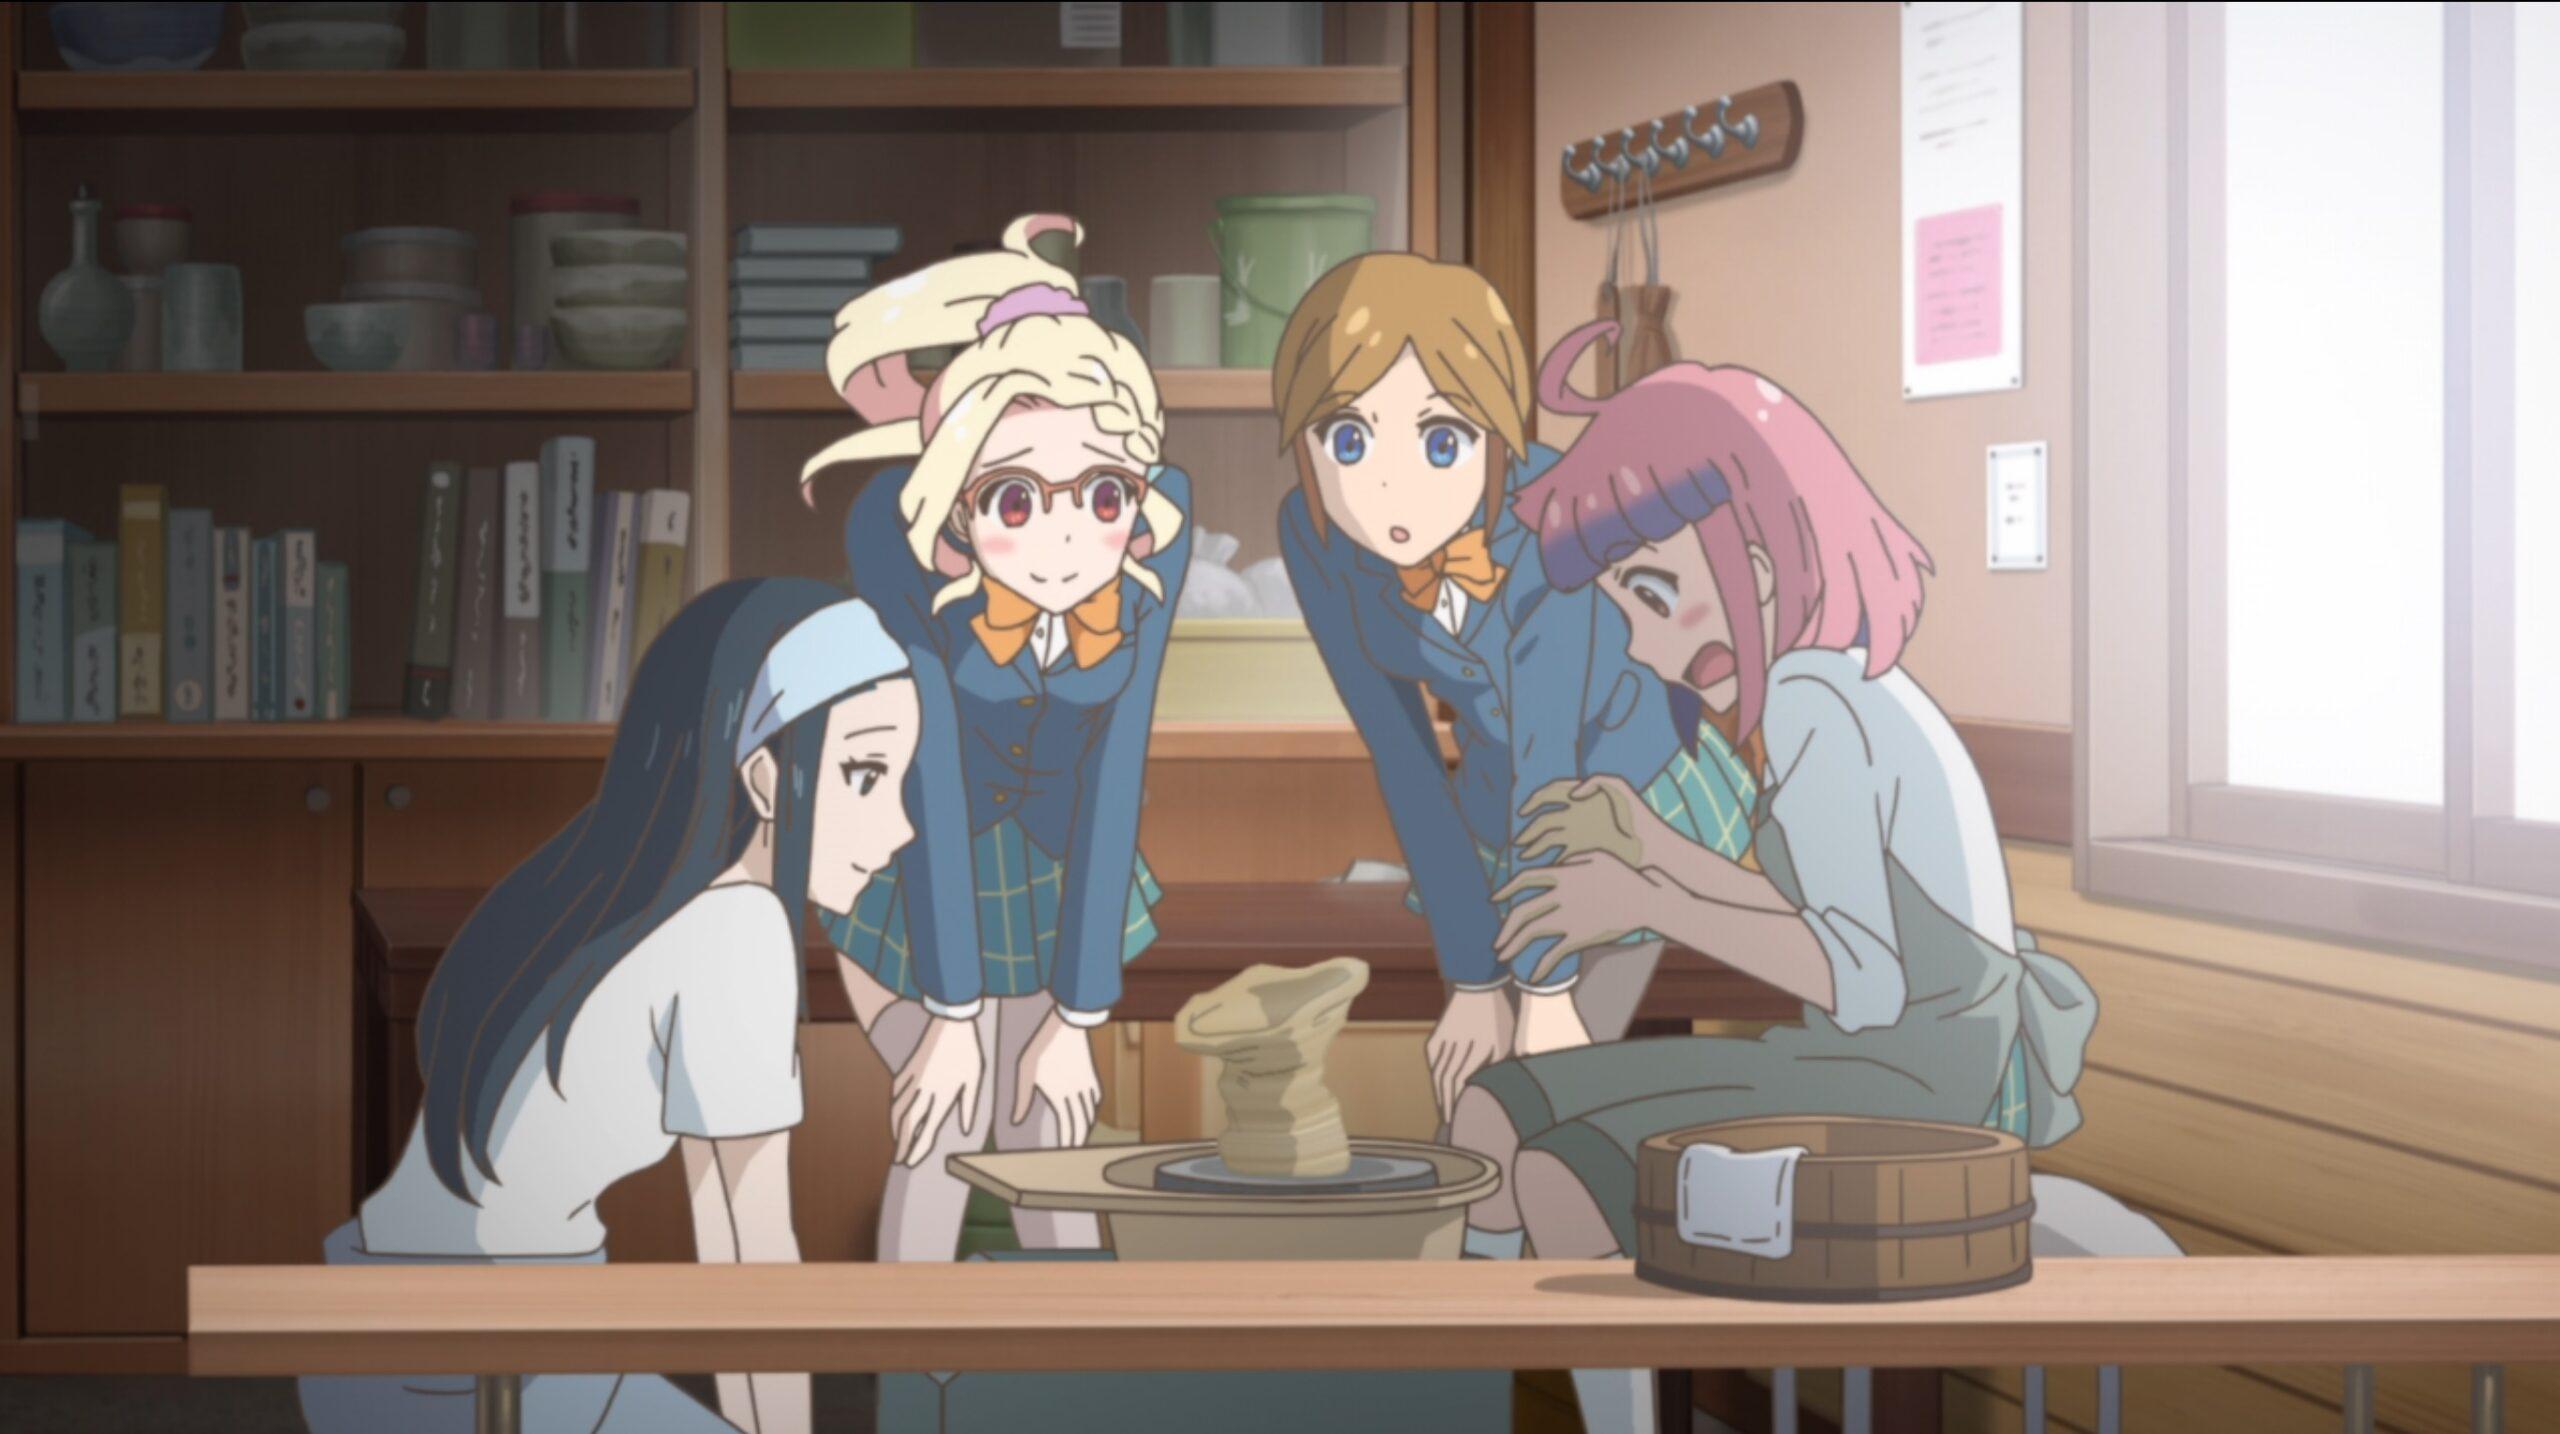 3 Cast Members Added To Let's Make a Mug Too Anime